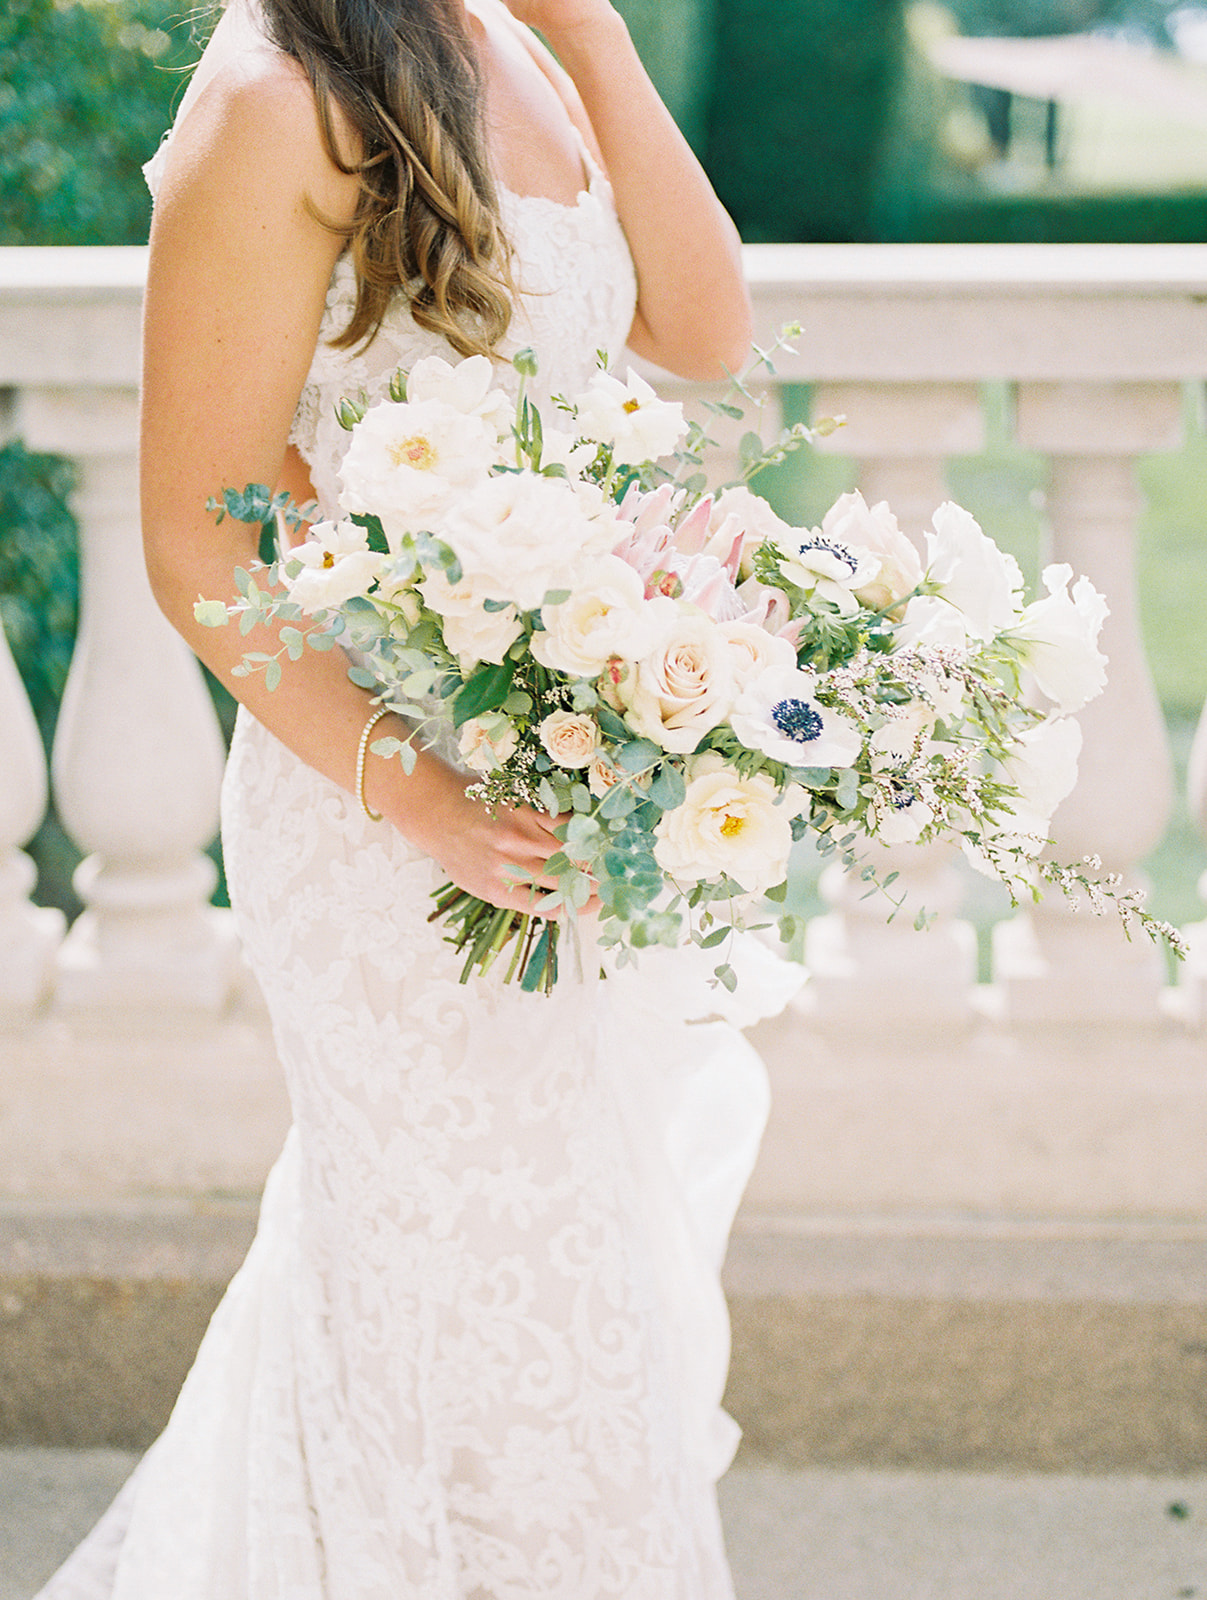 Melissa-Dave-Wedding-99.jpg